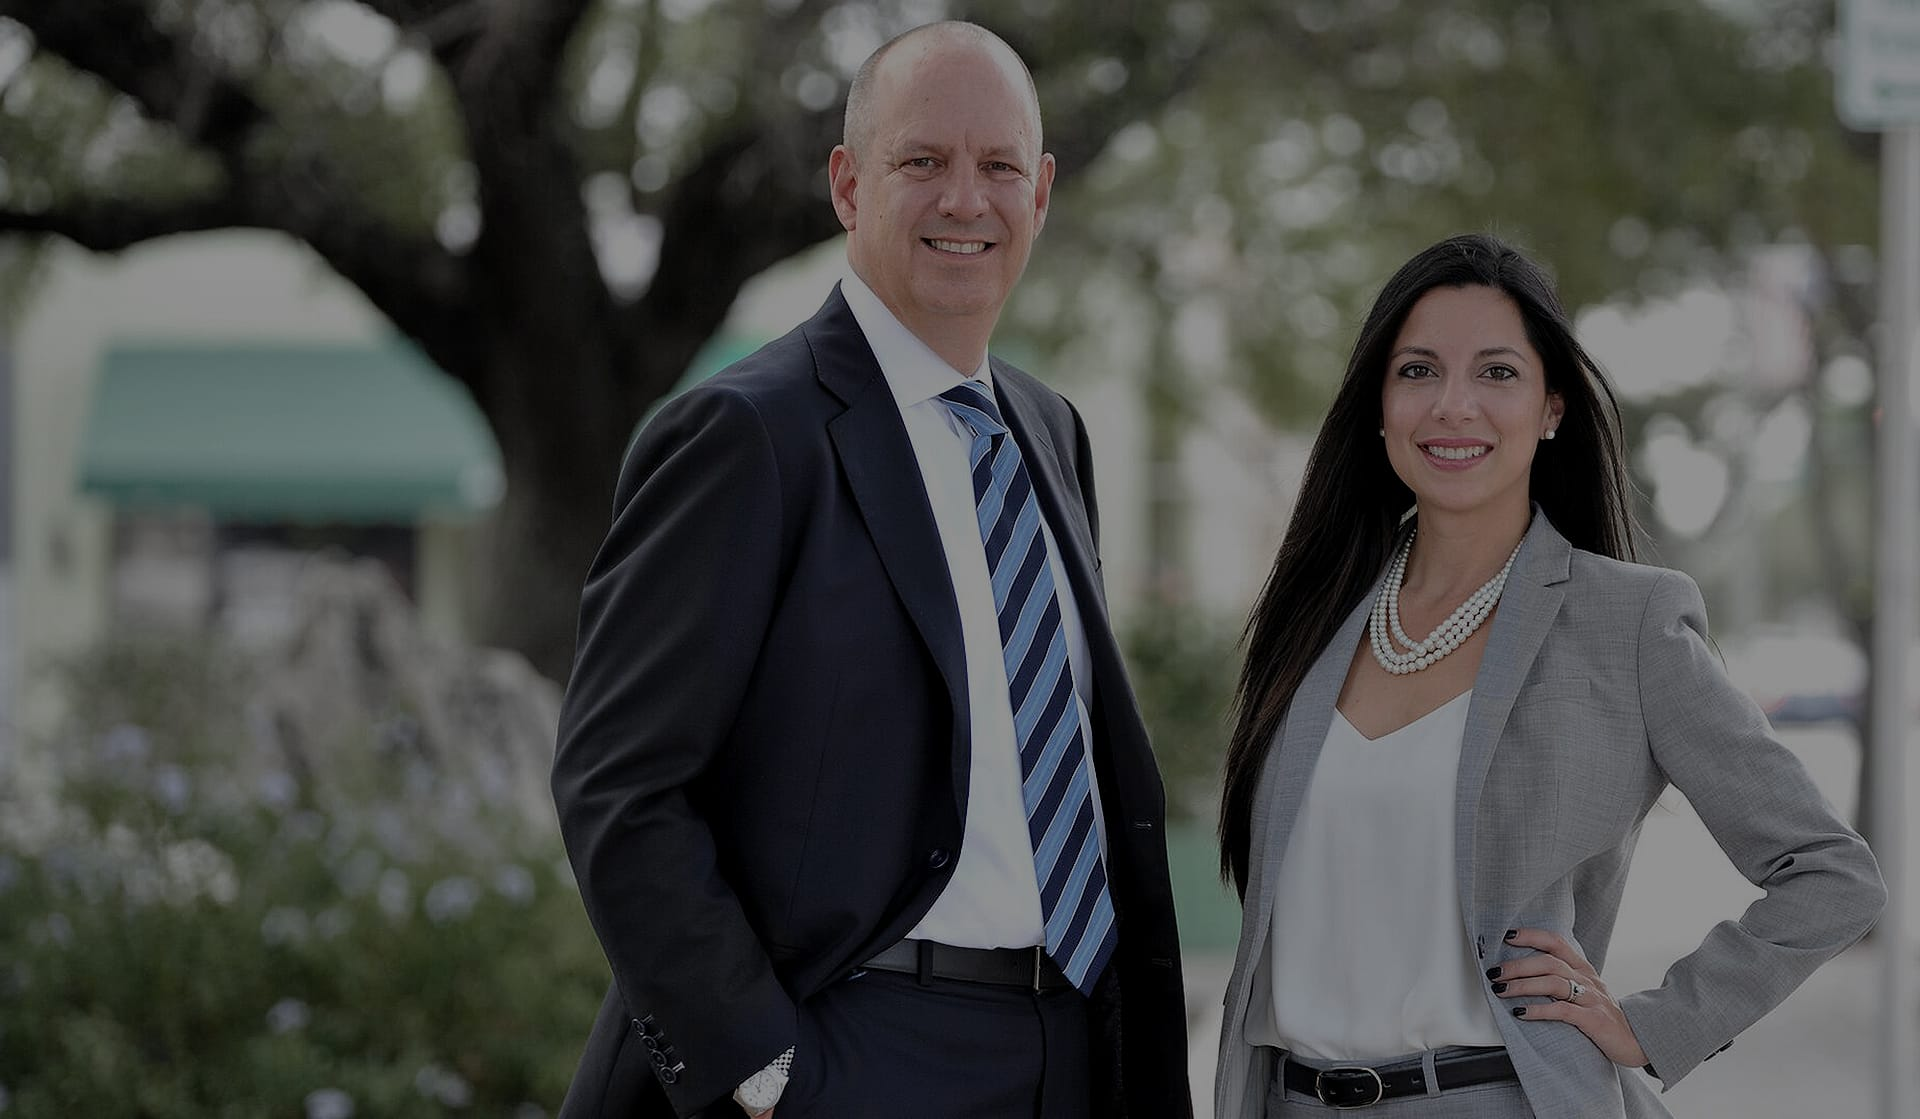 Charles Cartwright and Adriana Gonzalez